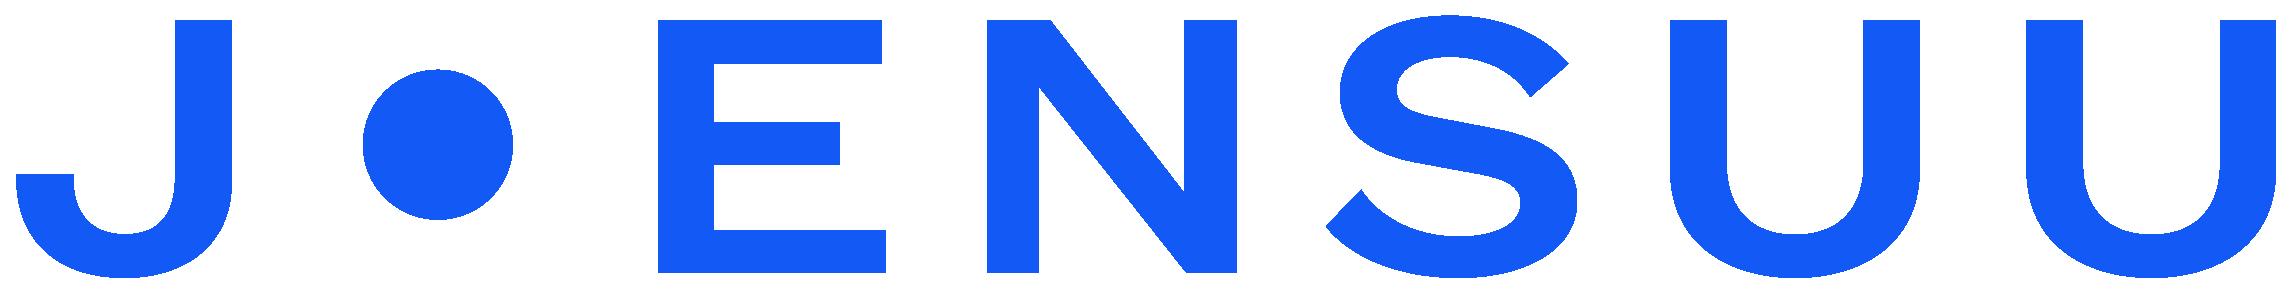 Joensuu kaupungin logo